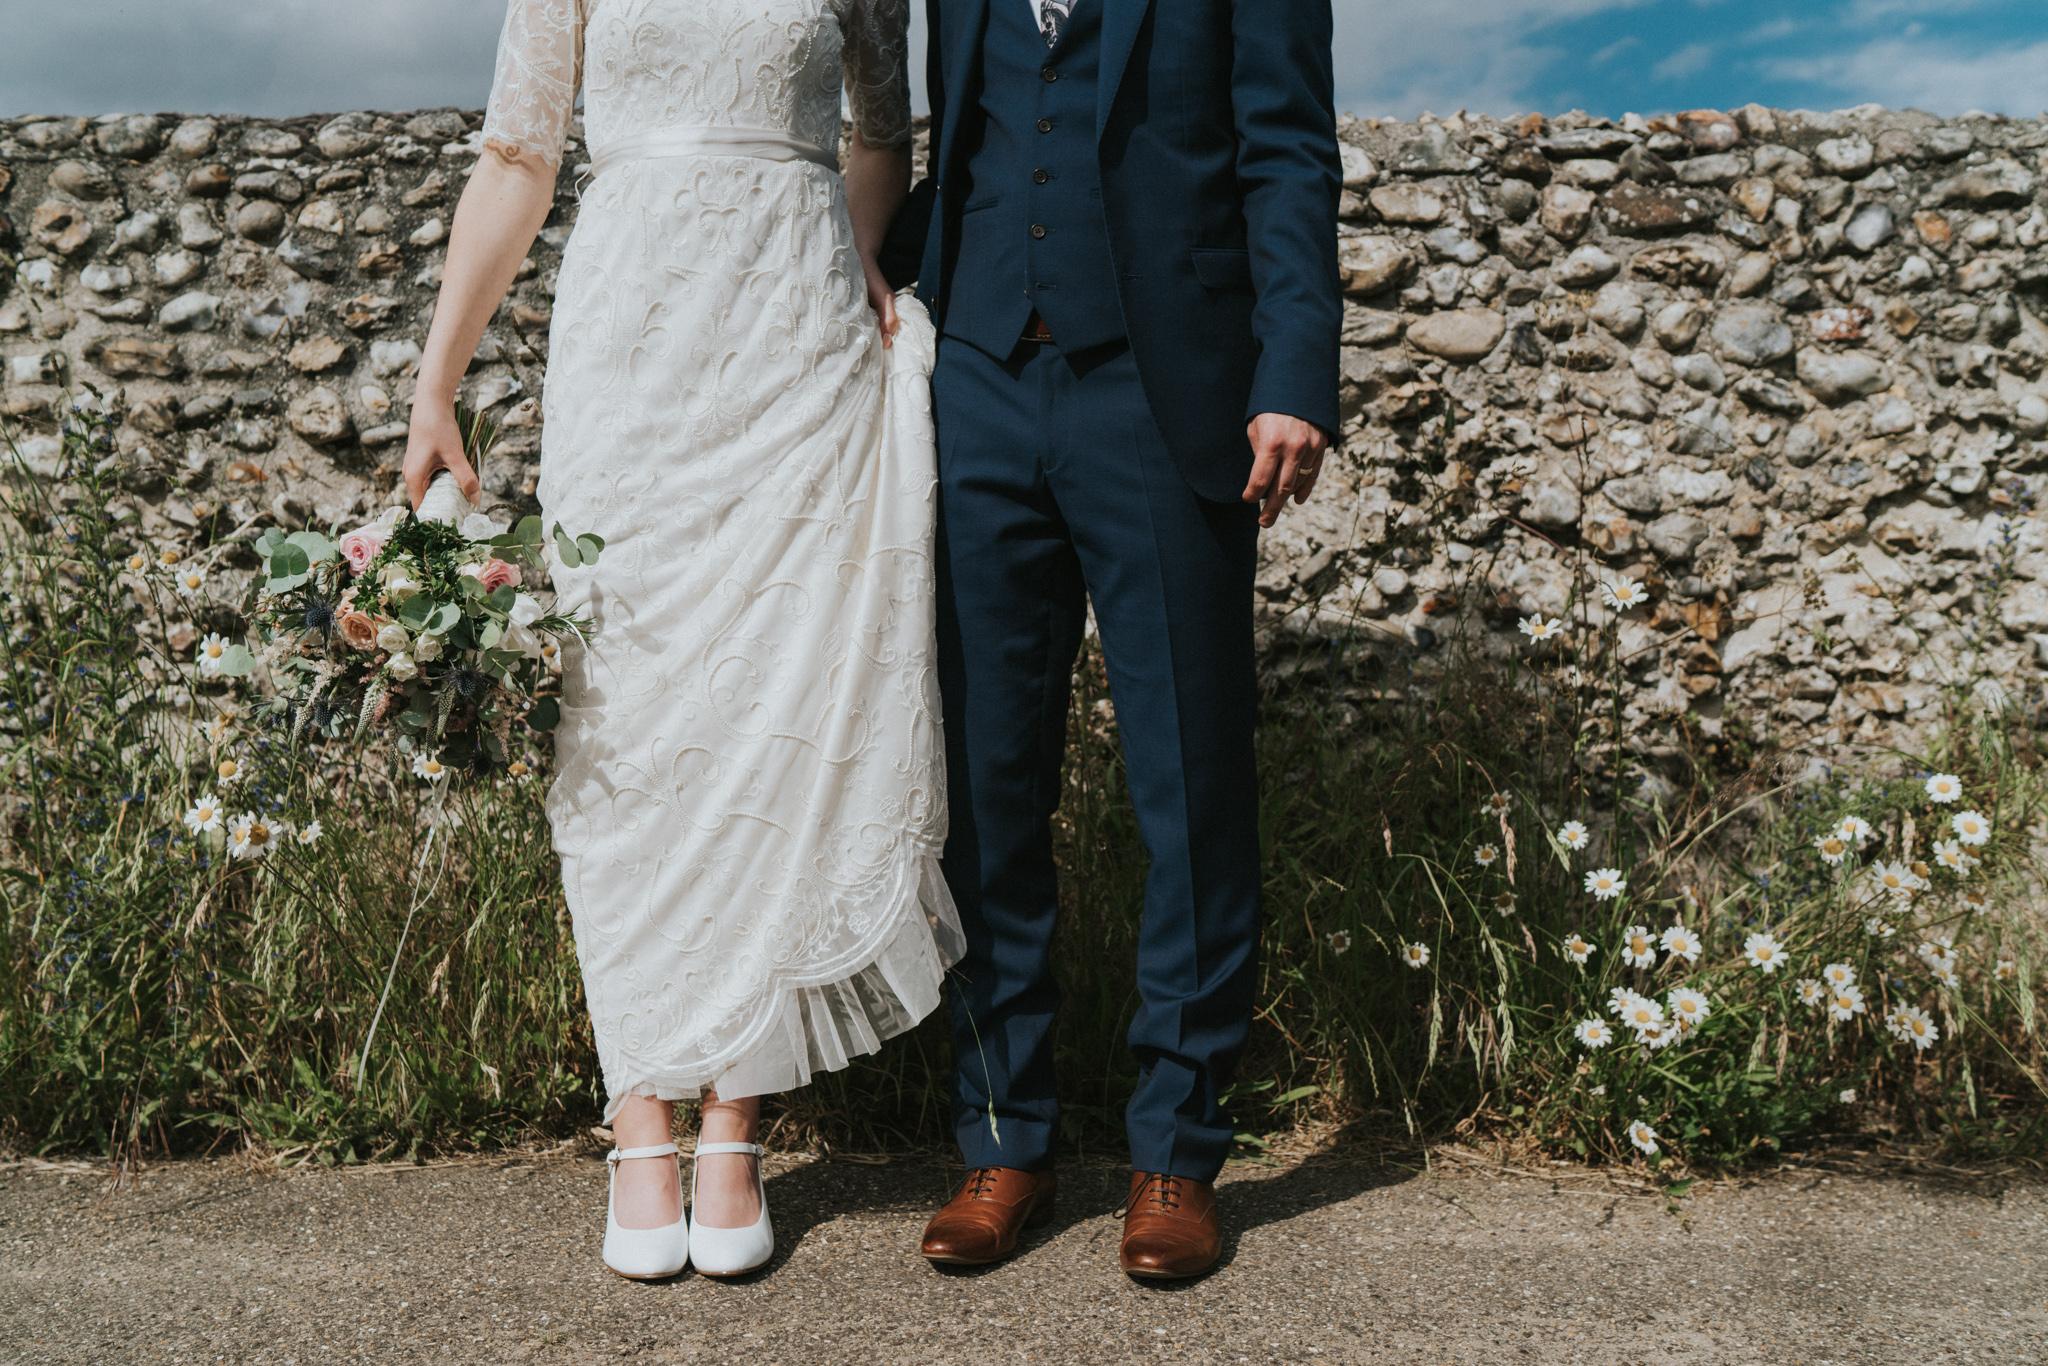 Jess-and-Tom-Norfolk-Alternative-Wedding-Essex-Wedding-Photographer-Grace-Elizabeth-18.jpg